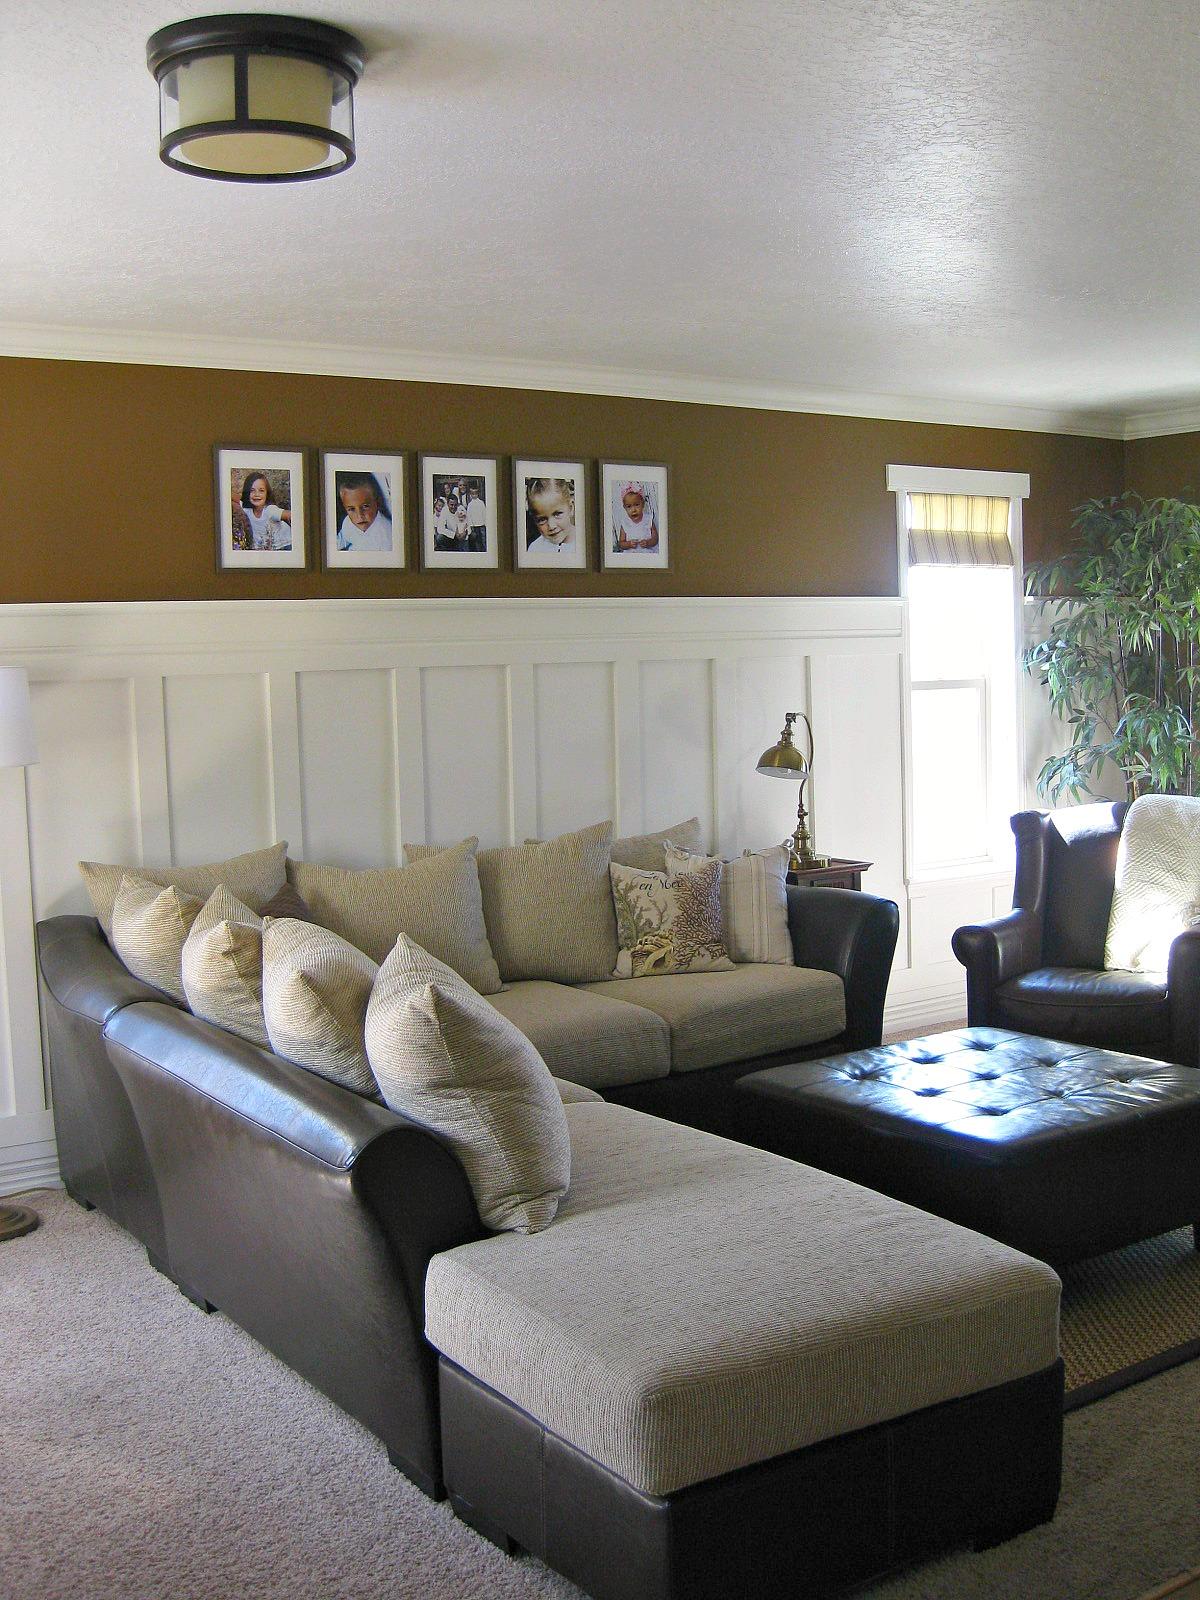 Living Room Wall Decor Gray Walls: TDA Decorating And Design: Board & Batten Accent Wall Tutorial